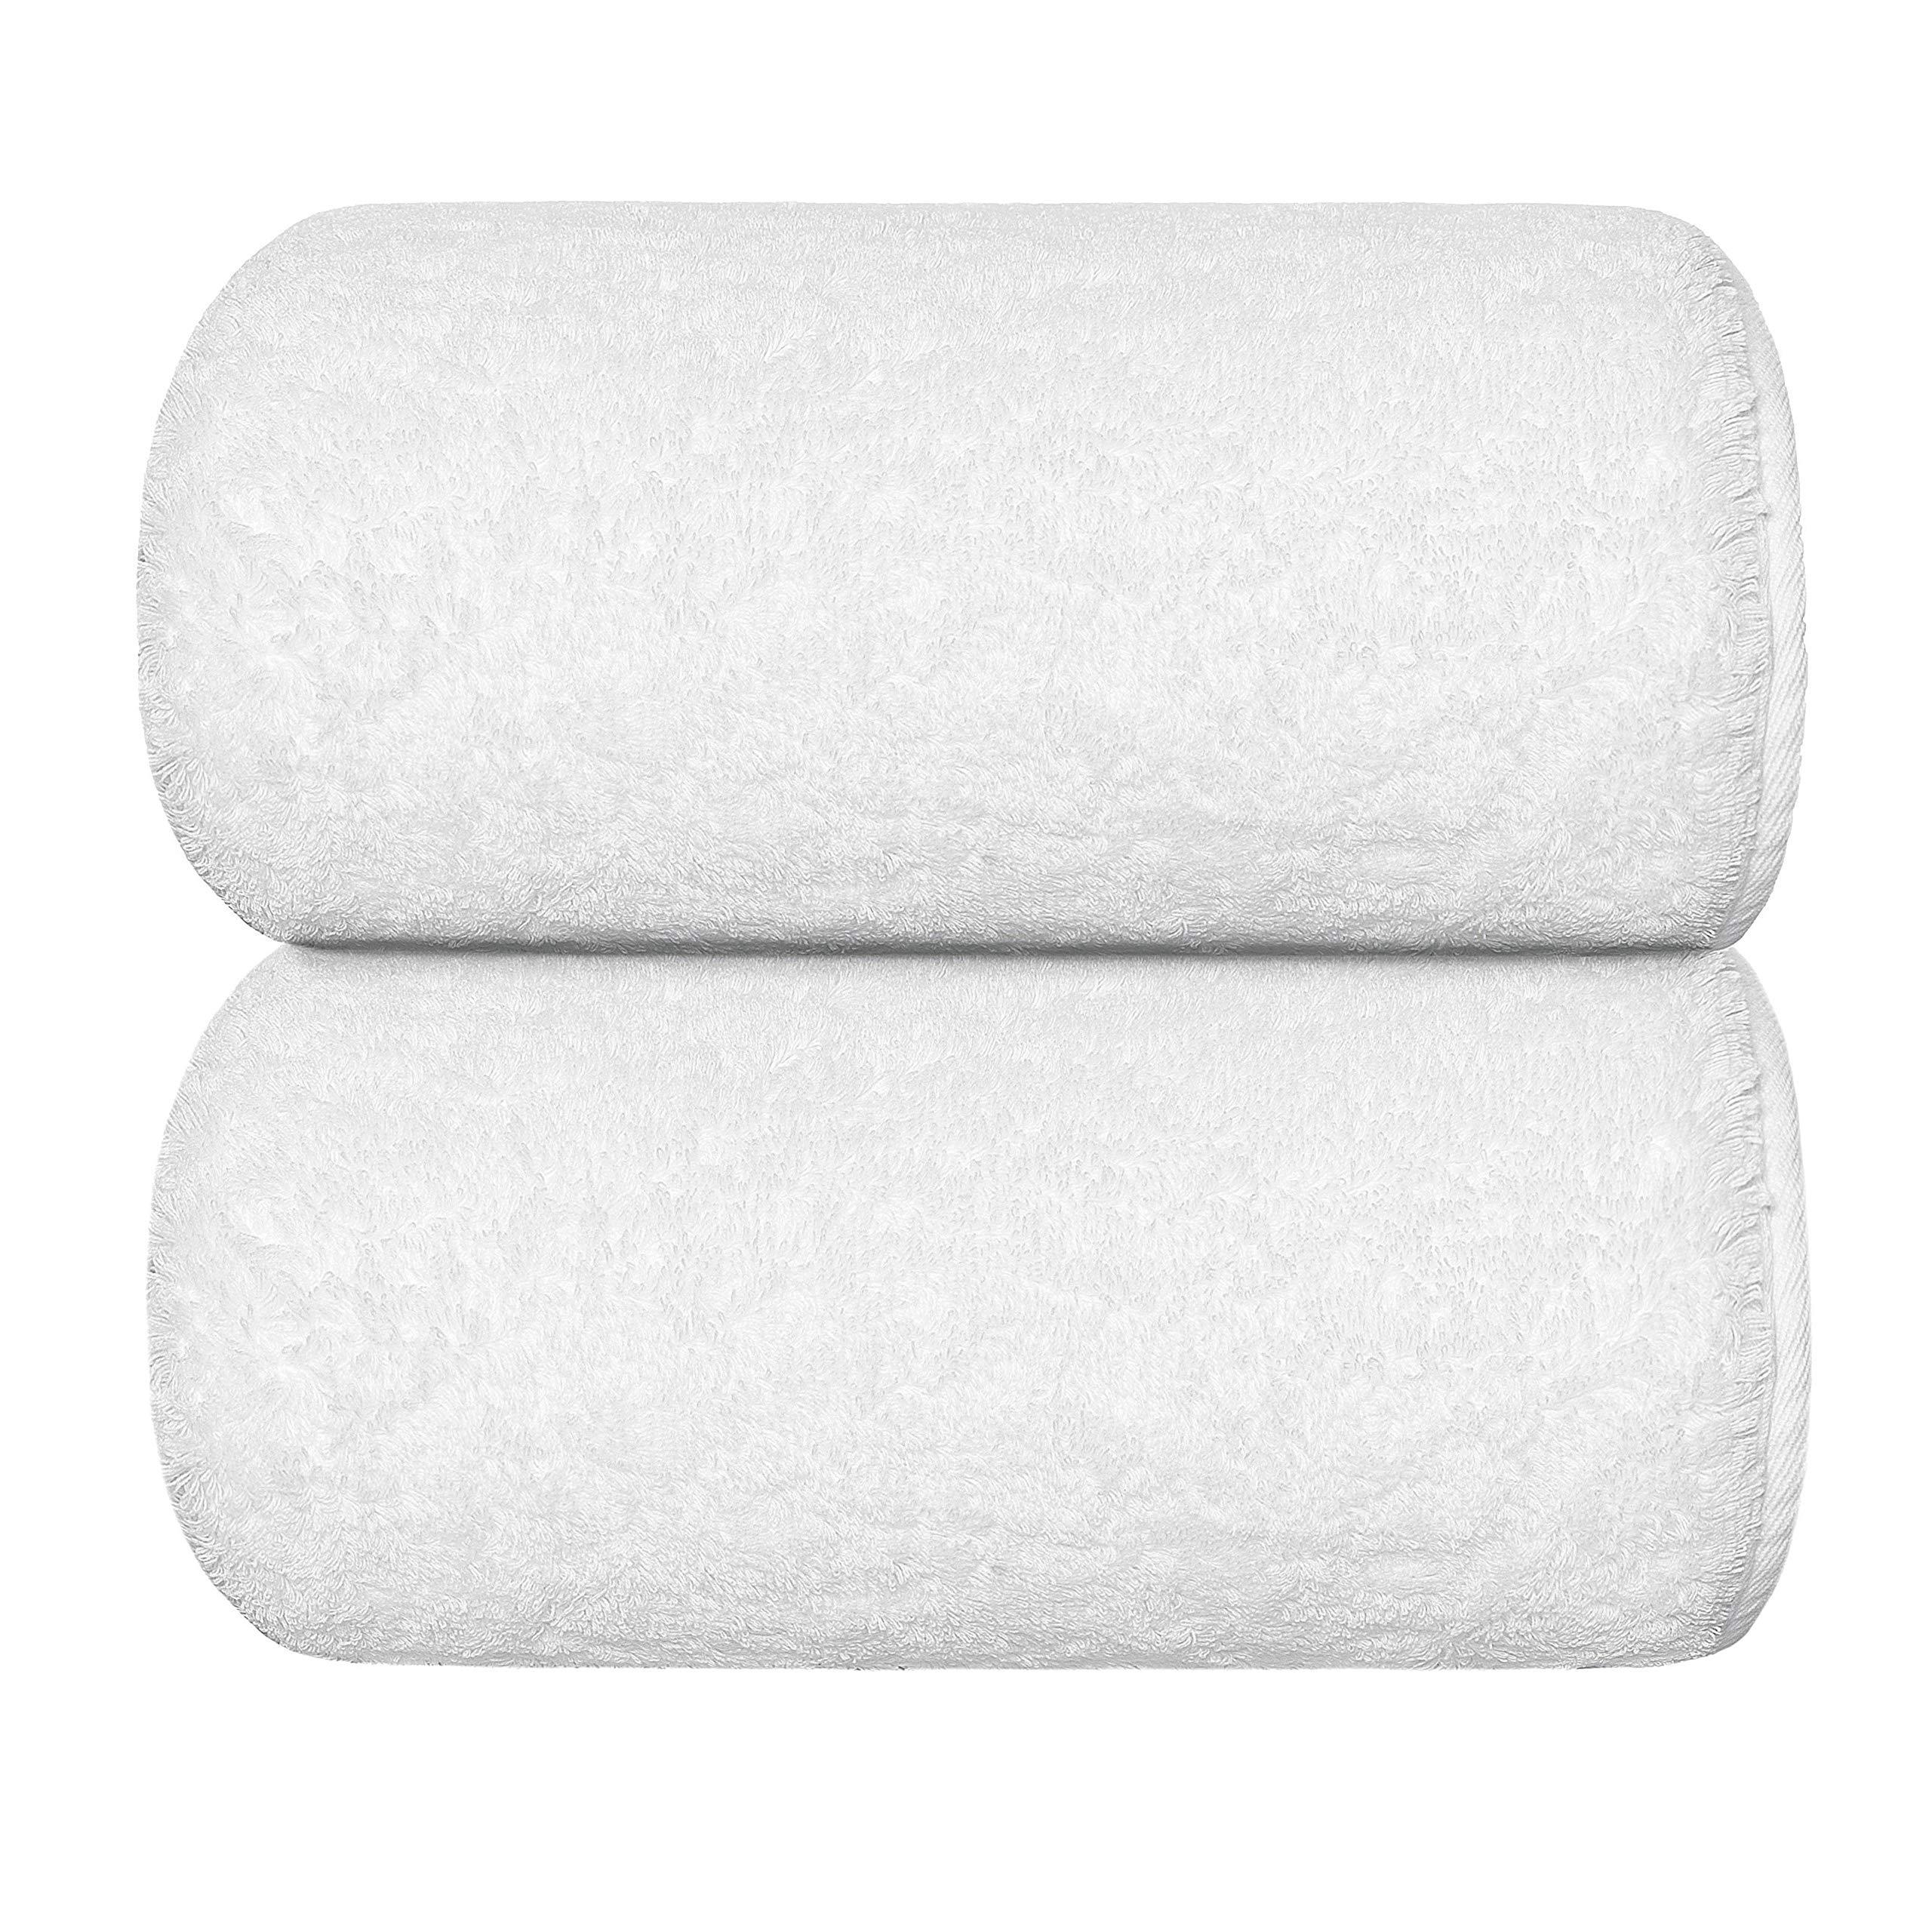 Graccioza Egoist Bath Sheet (41'' x 72'') - White - Made in Portugal, 800-GSM, 100% Egyptian Giza Cotton by Graccioza Collection (Image #1)